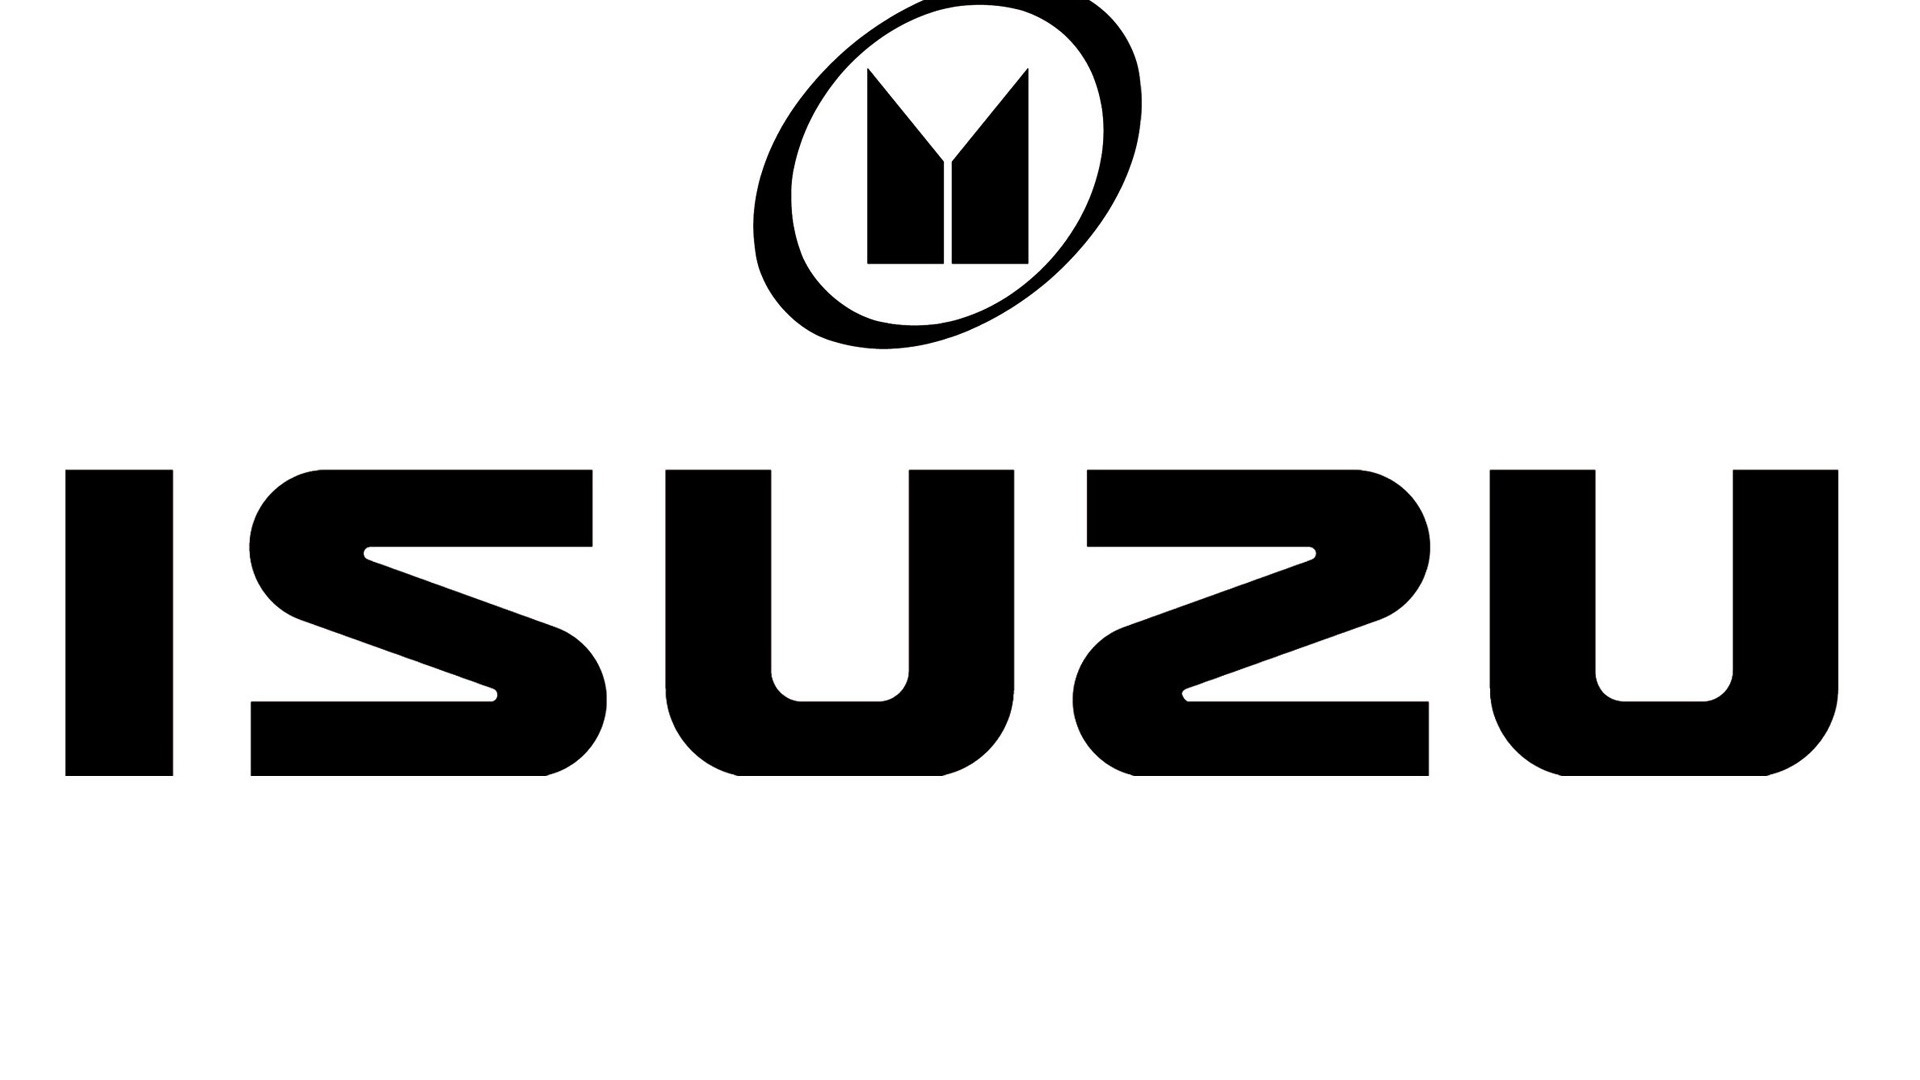 Download Wallpaper X Isuzu Auto Parts